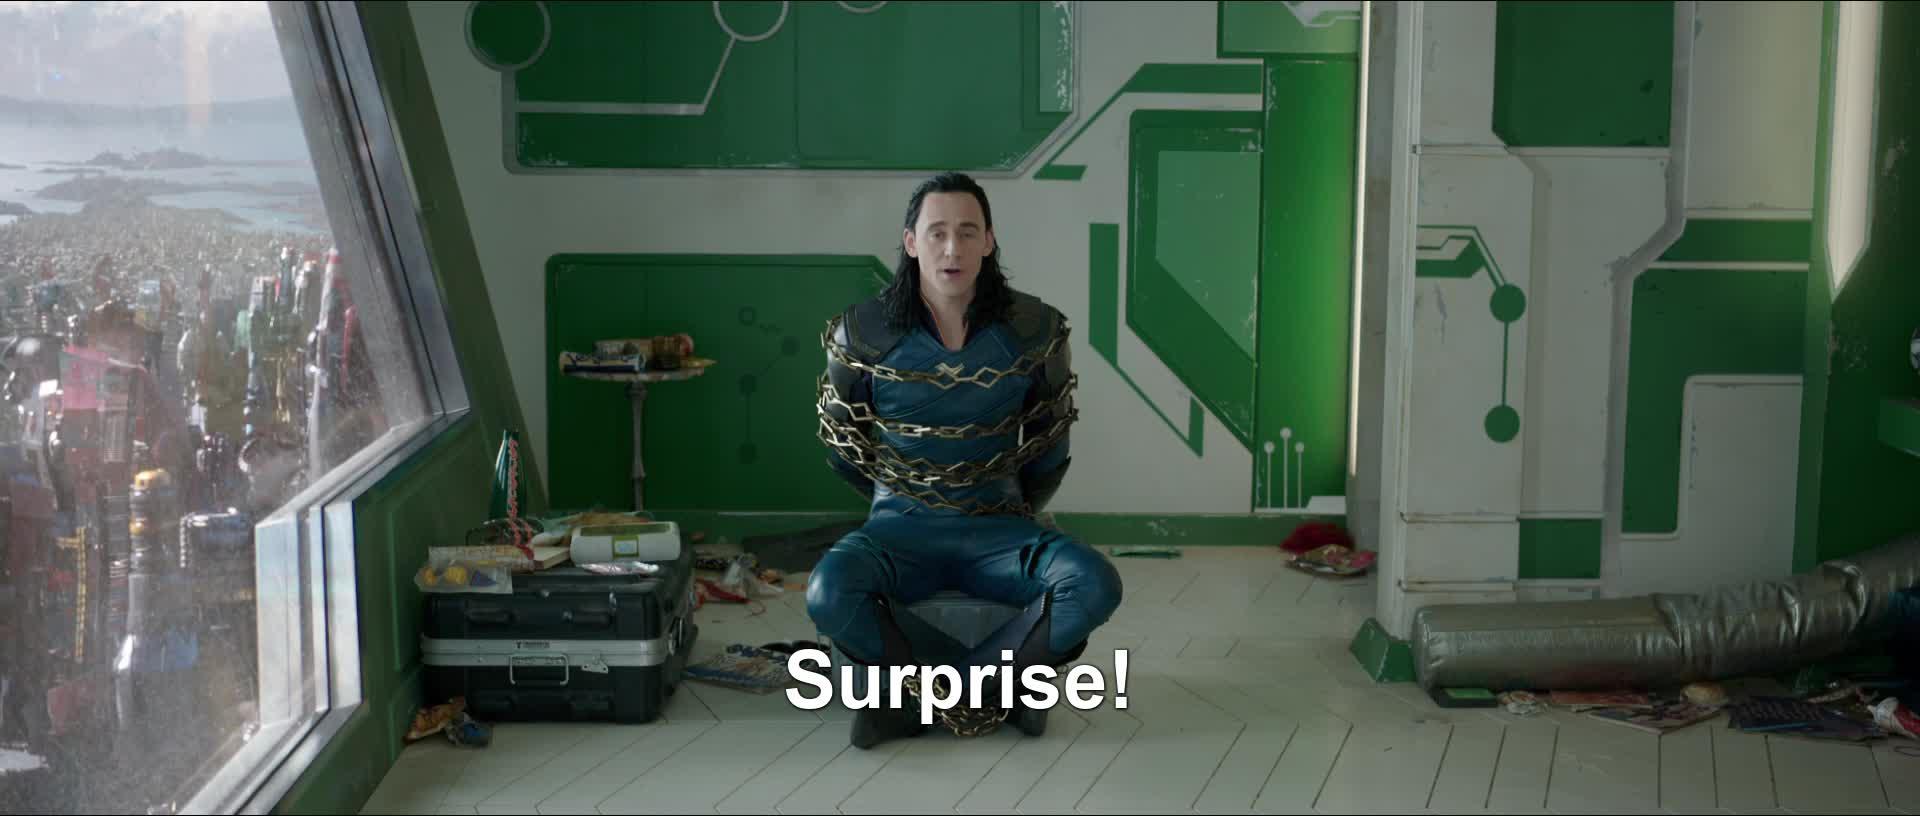 loki, ragnarok, surprise, thor, thor ragnarok, Surprise GIFs